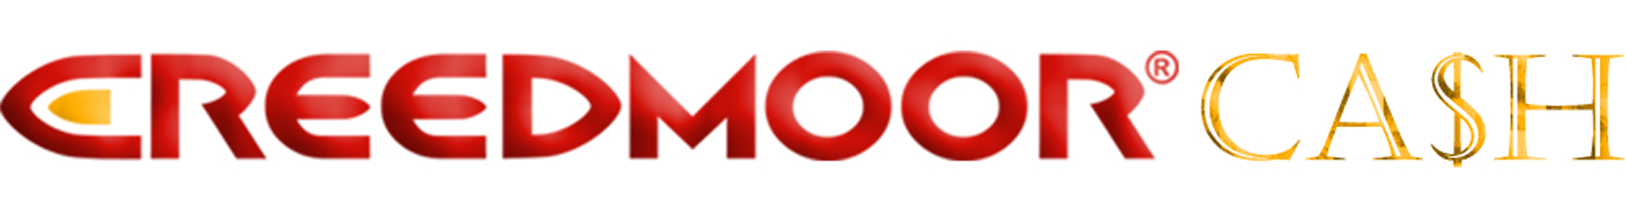 Creedmoor® Sports Launches Cash Rewards Program